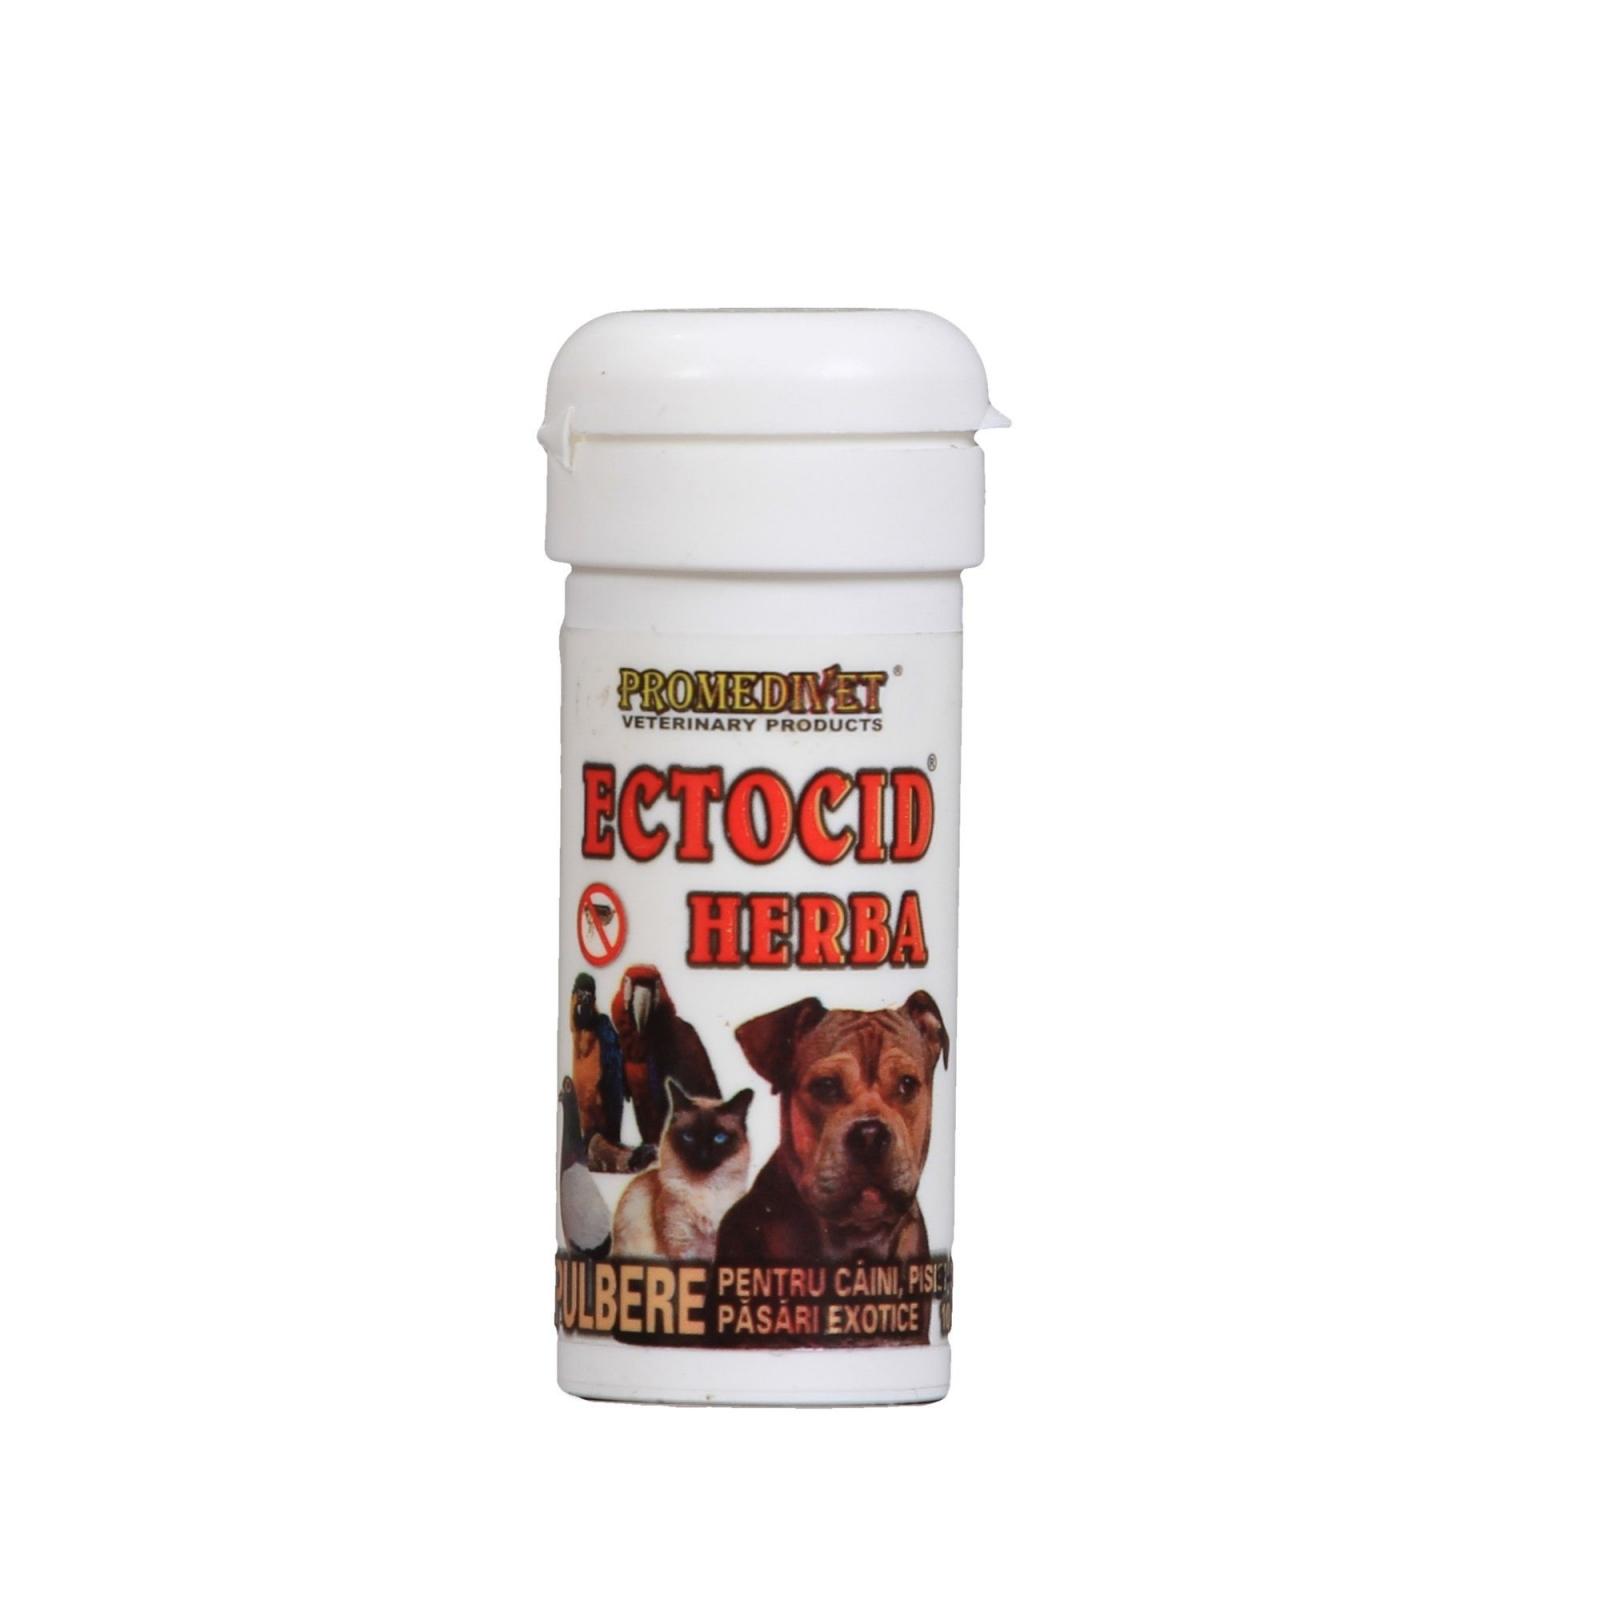 Praf Antiparazitar Ectocid Herba 10 g